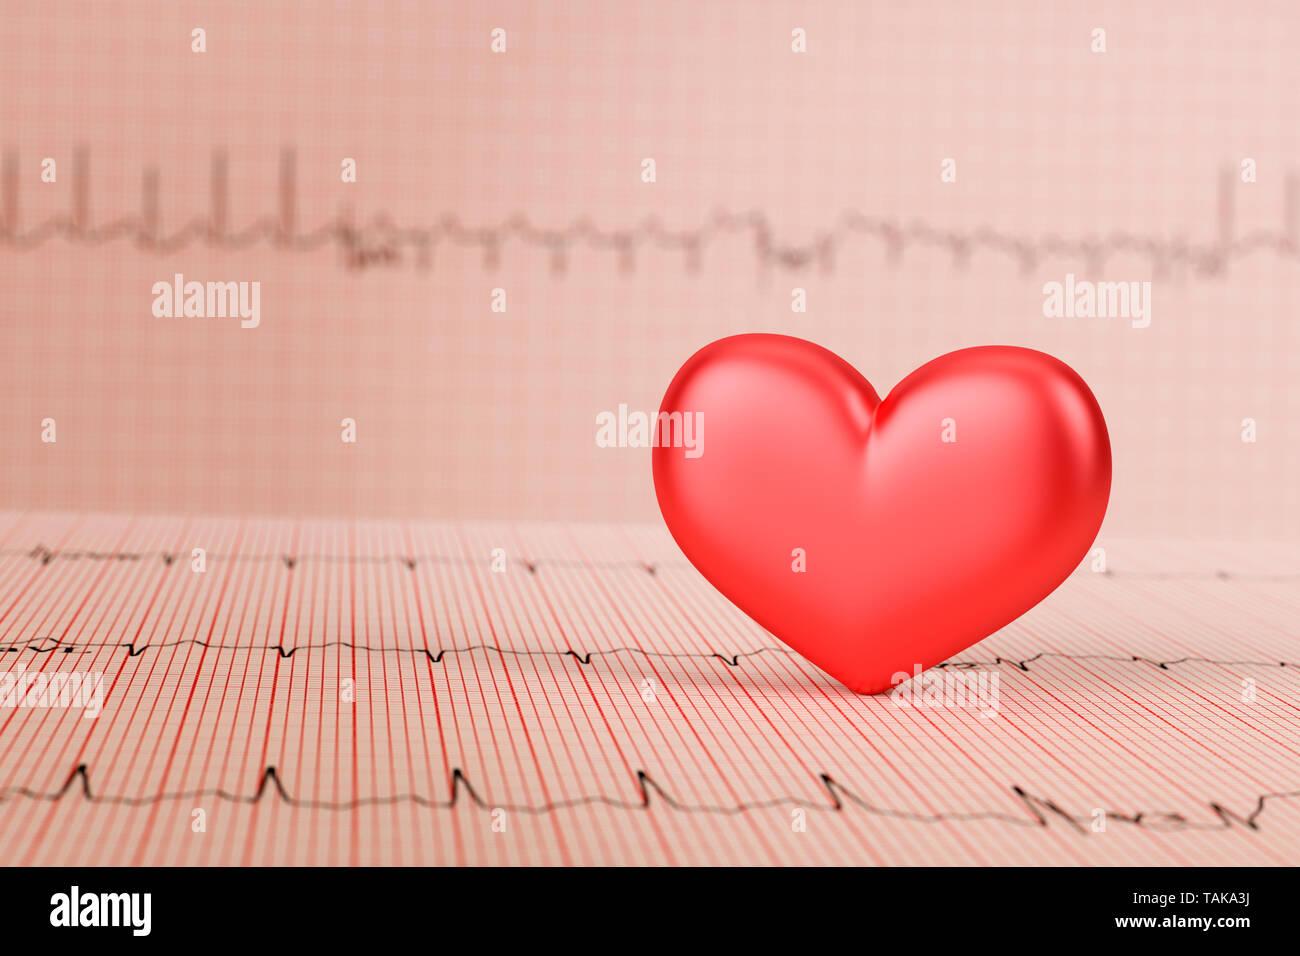 Cardiac Stress Test Stock Photos Amp Cardiac Stress Test Stock Images